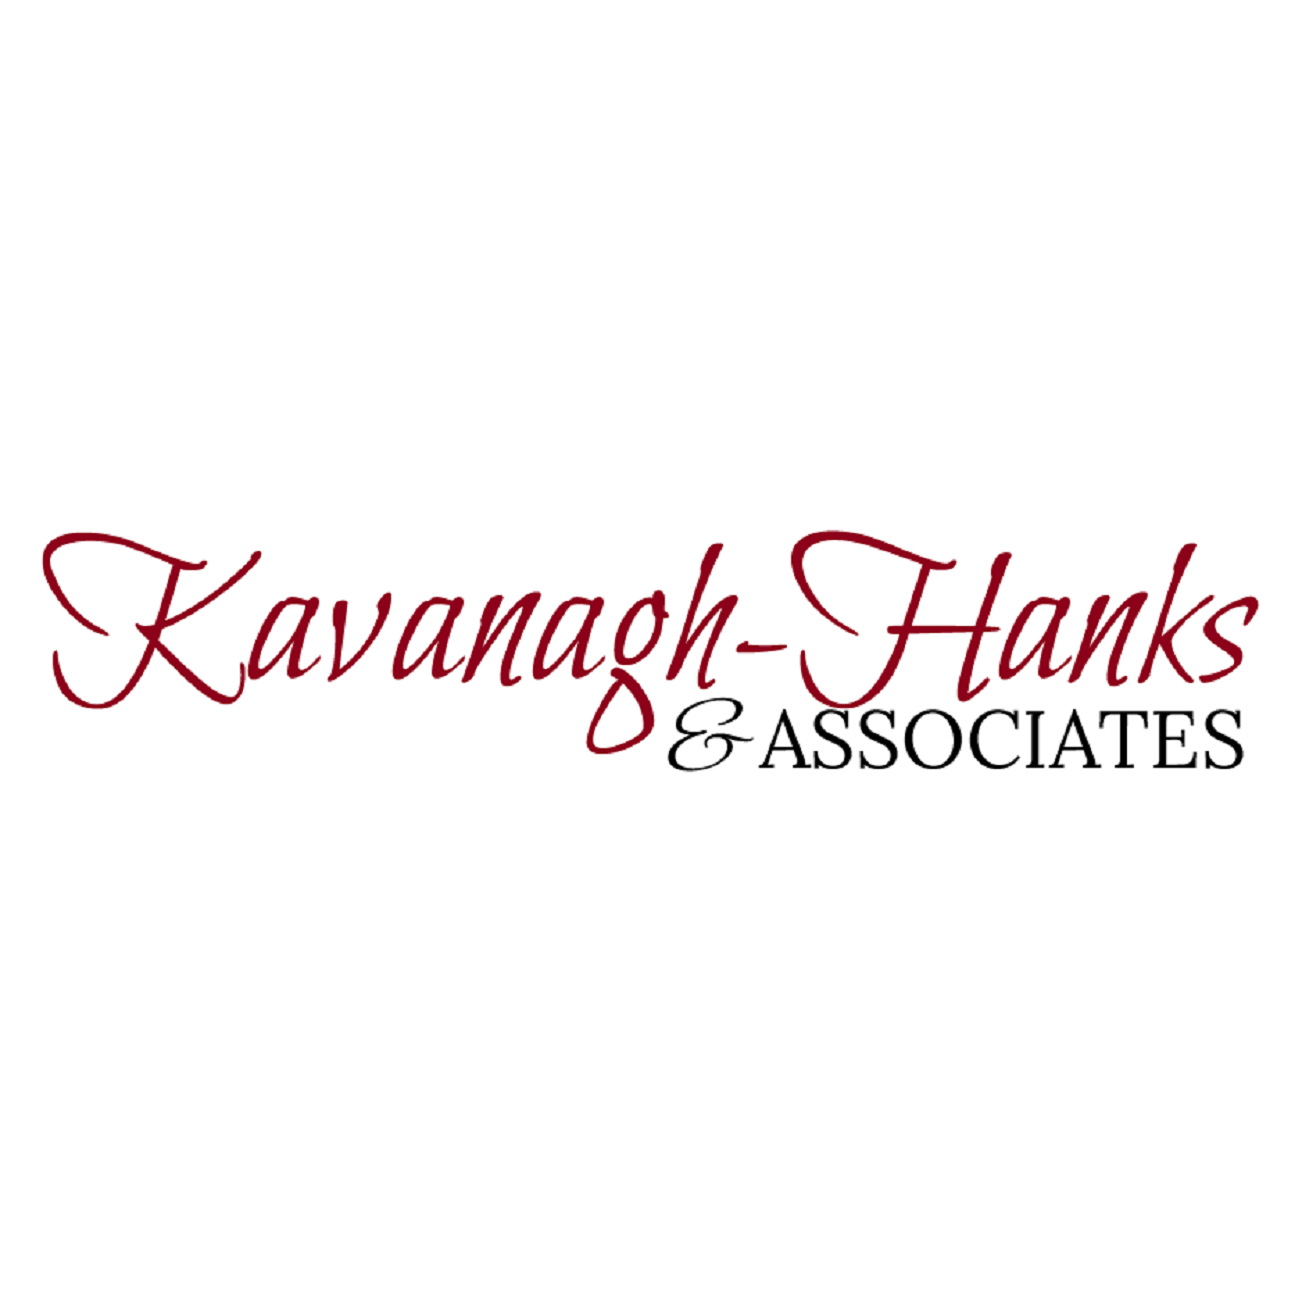 Kavanagh-Hanks & Associates